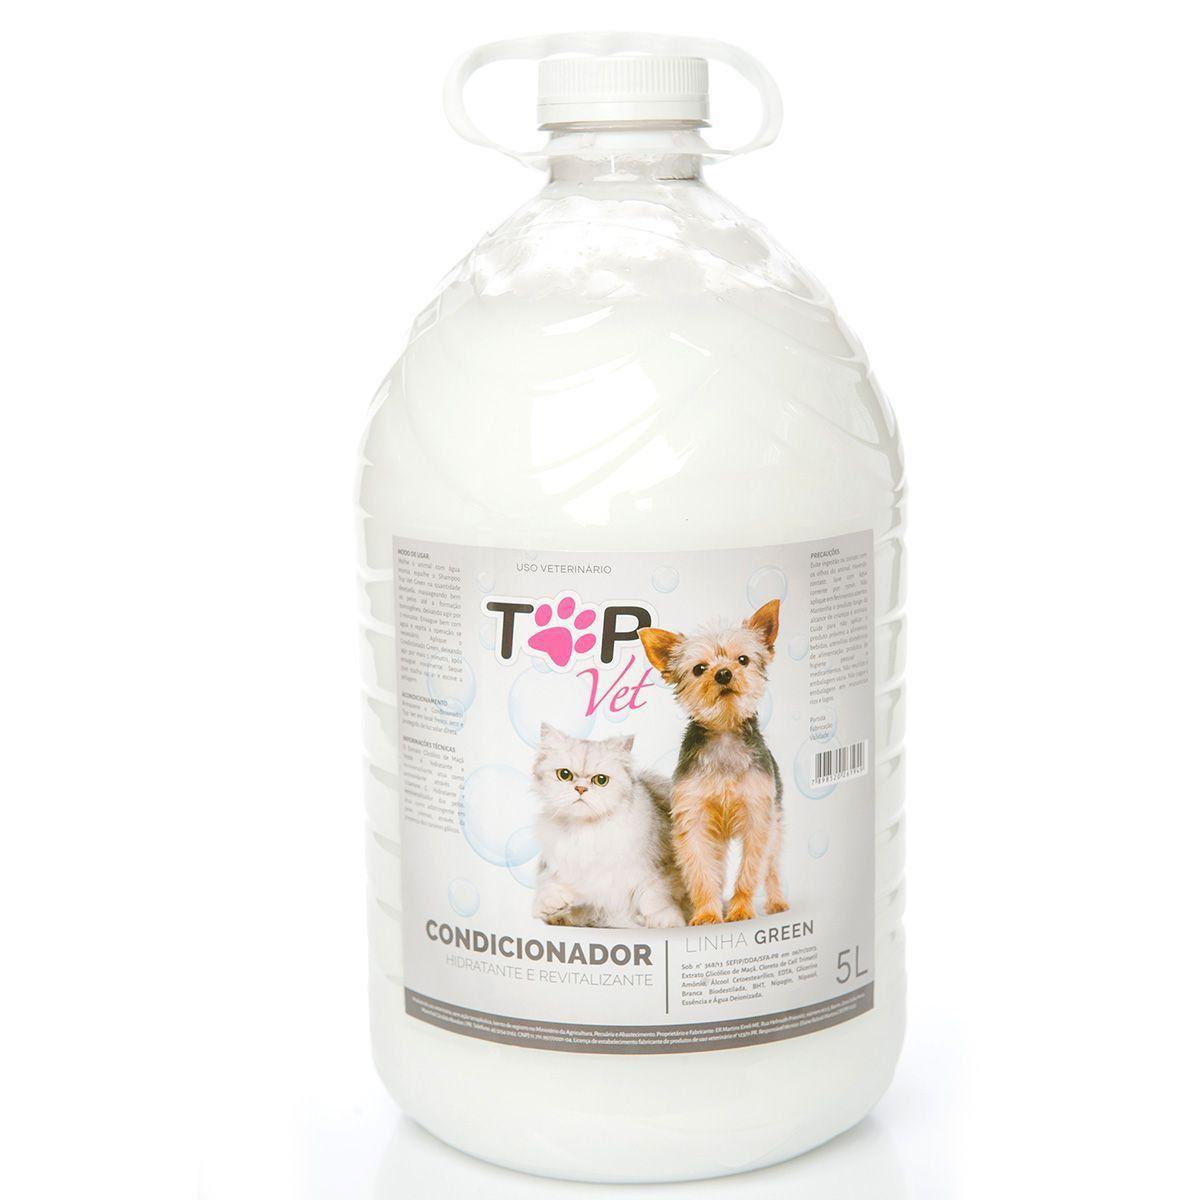 Kit Shampoo Neutro Maracujá e Condicionador Green Top Vet